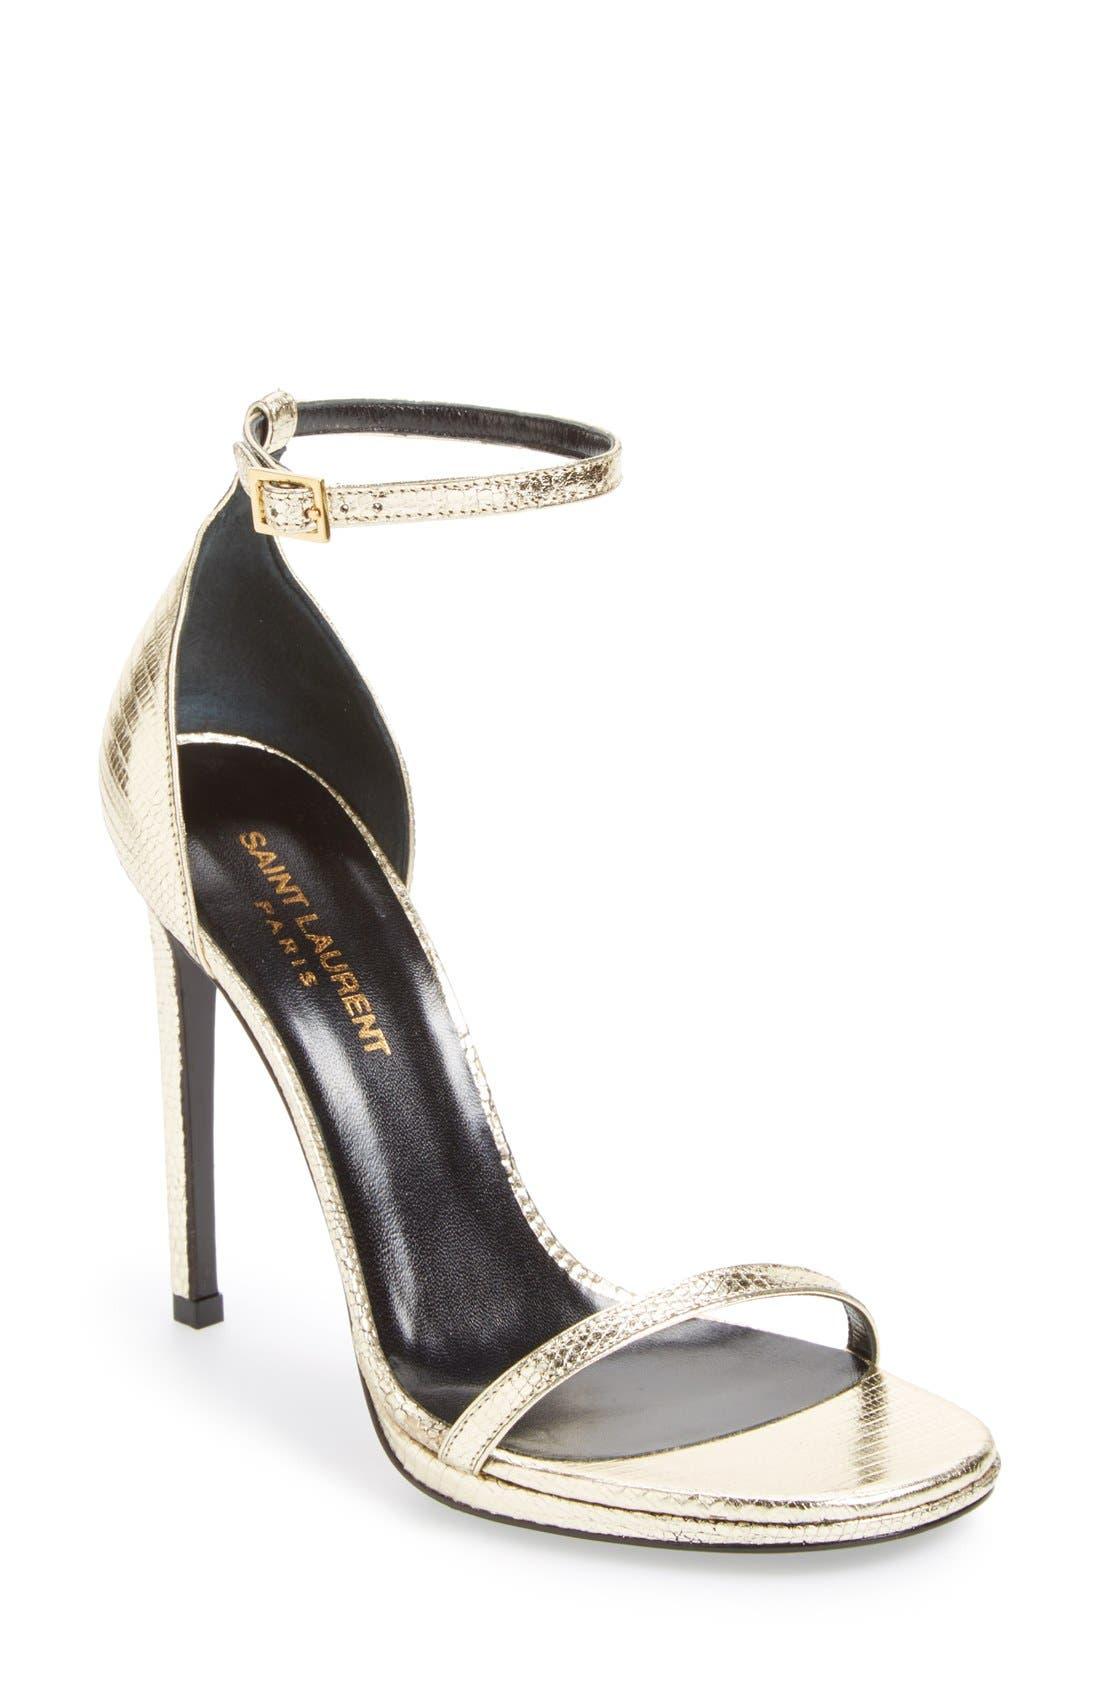 Alternate Image 1 Selected - Saint Laurent 'Jane' Metallic Lizard Embossed Ankle Strap Sandal (Women)